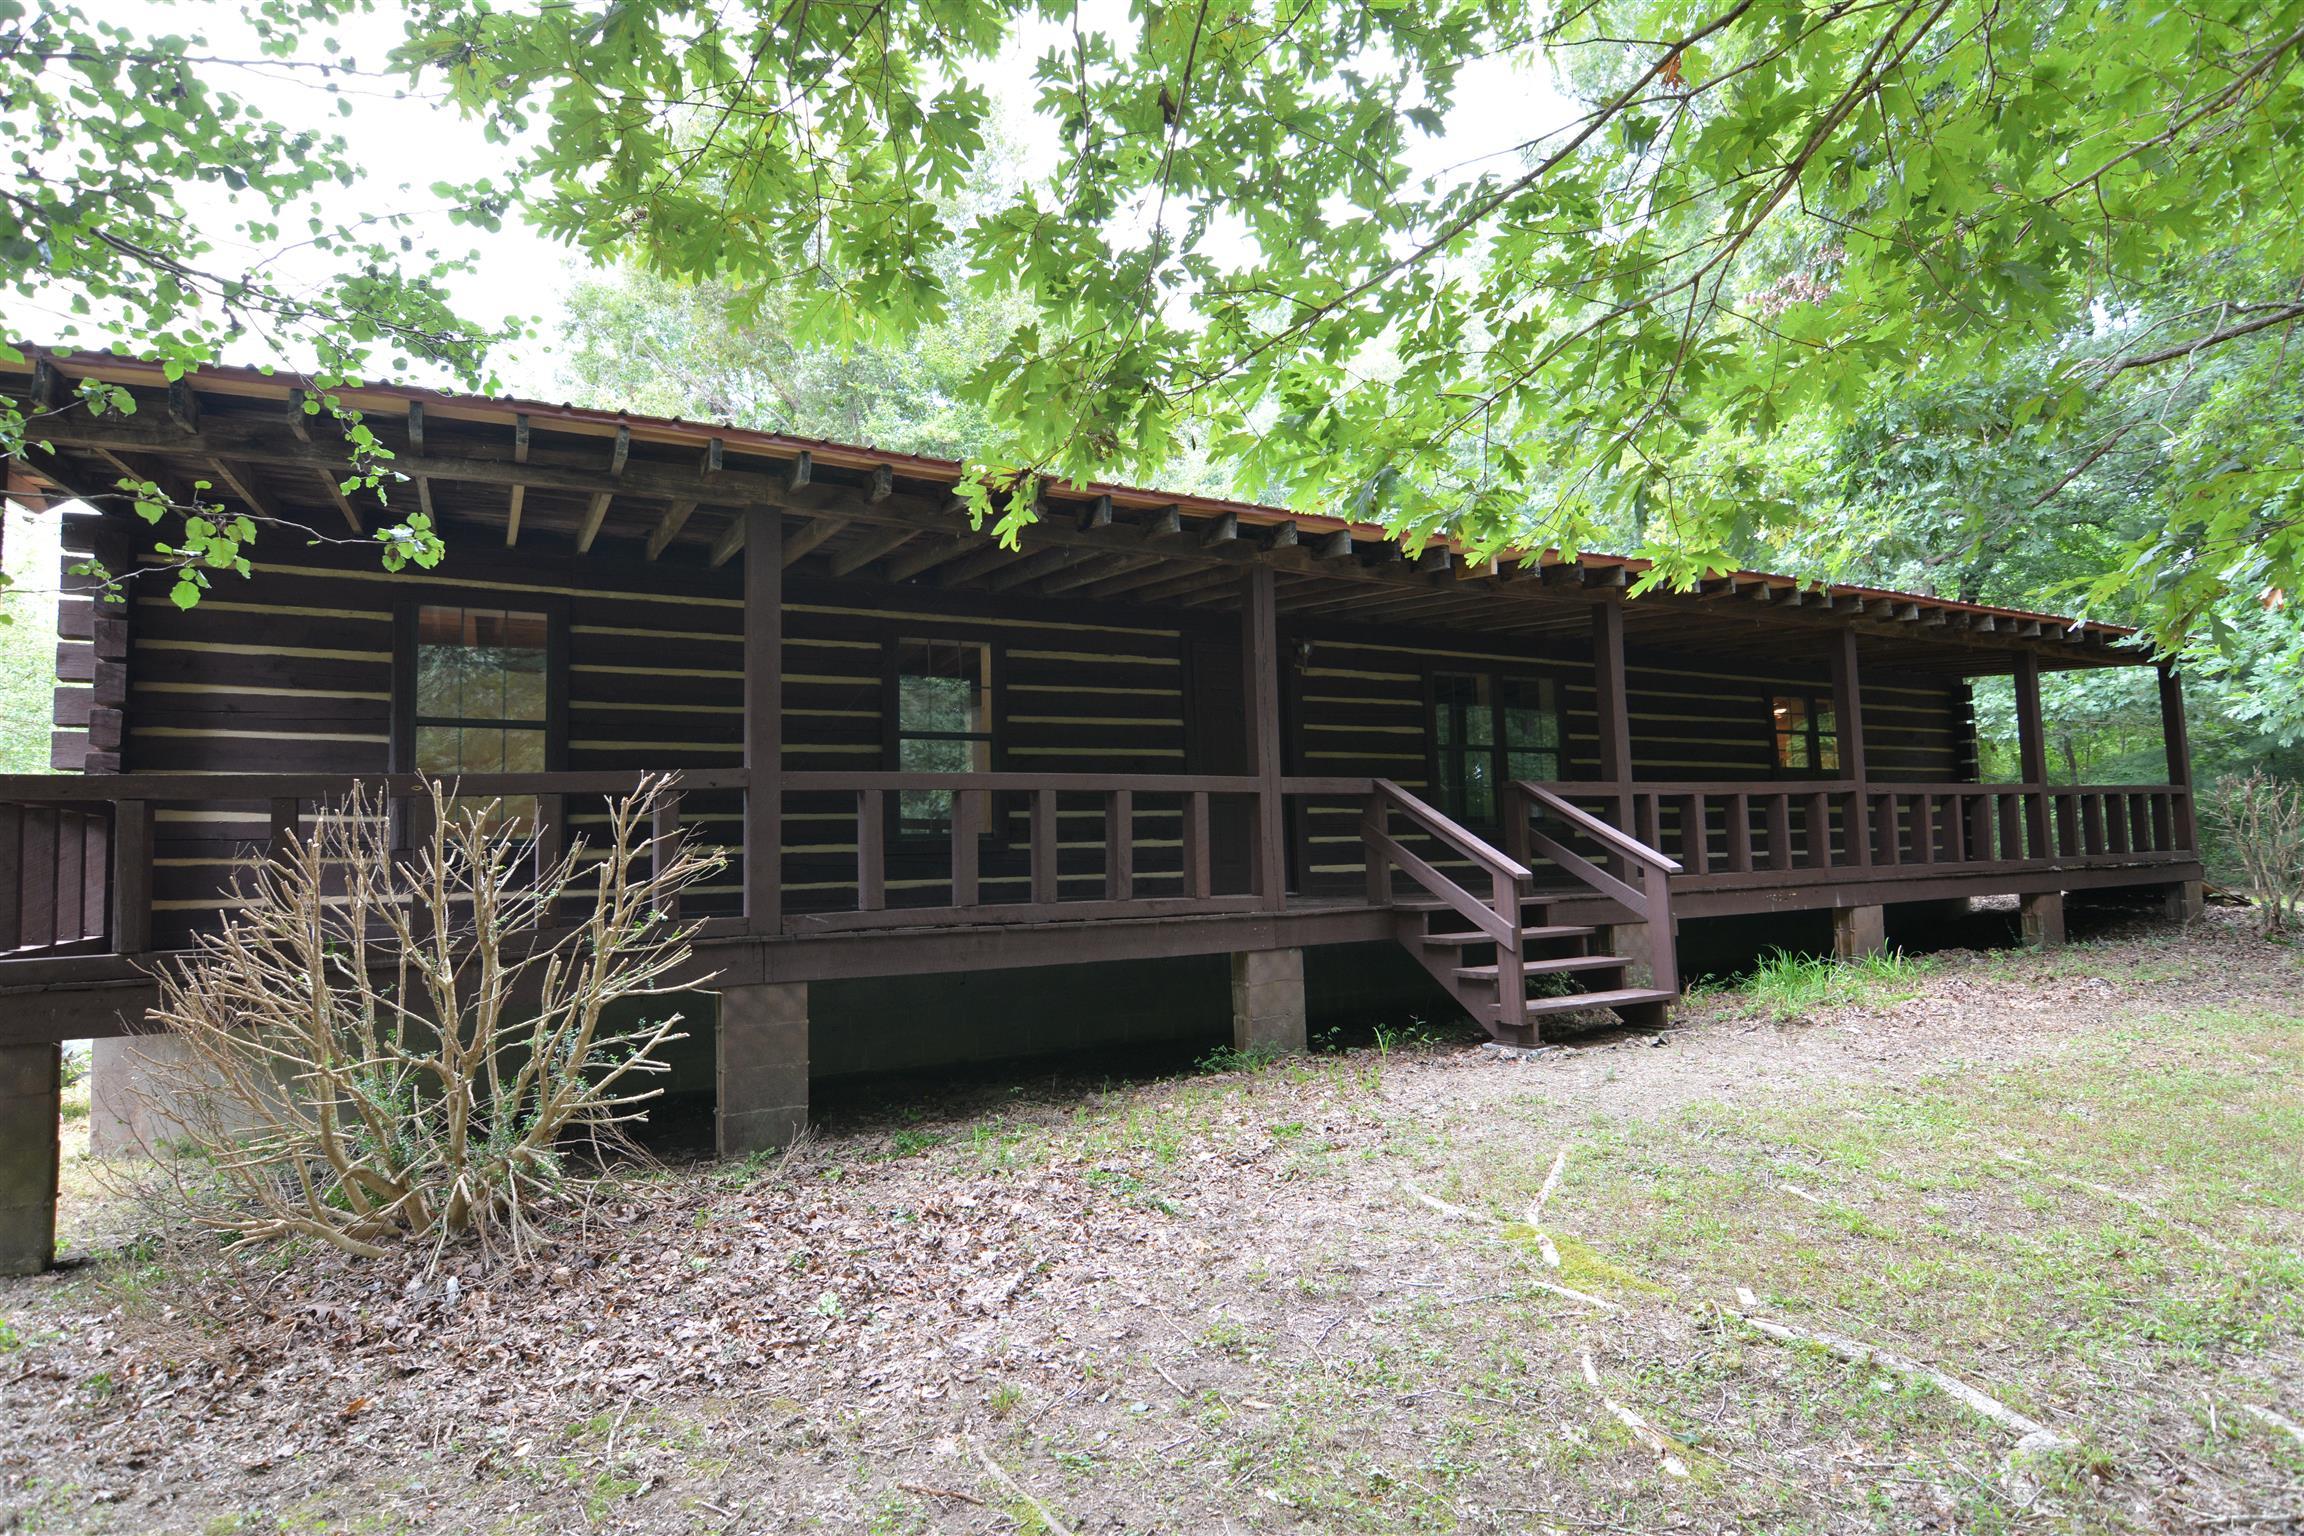 3261 Ridgeville Rd, Tullahoma, TN 37388 - Tullahoma, TN real estate listing